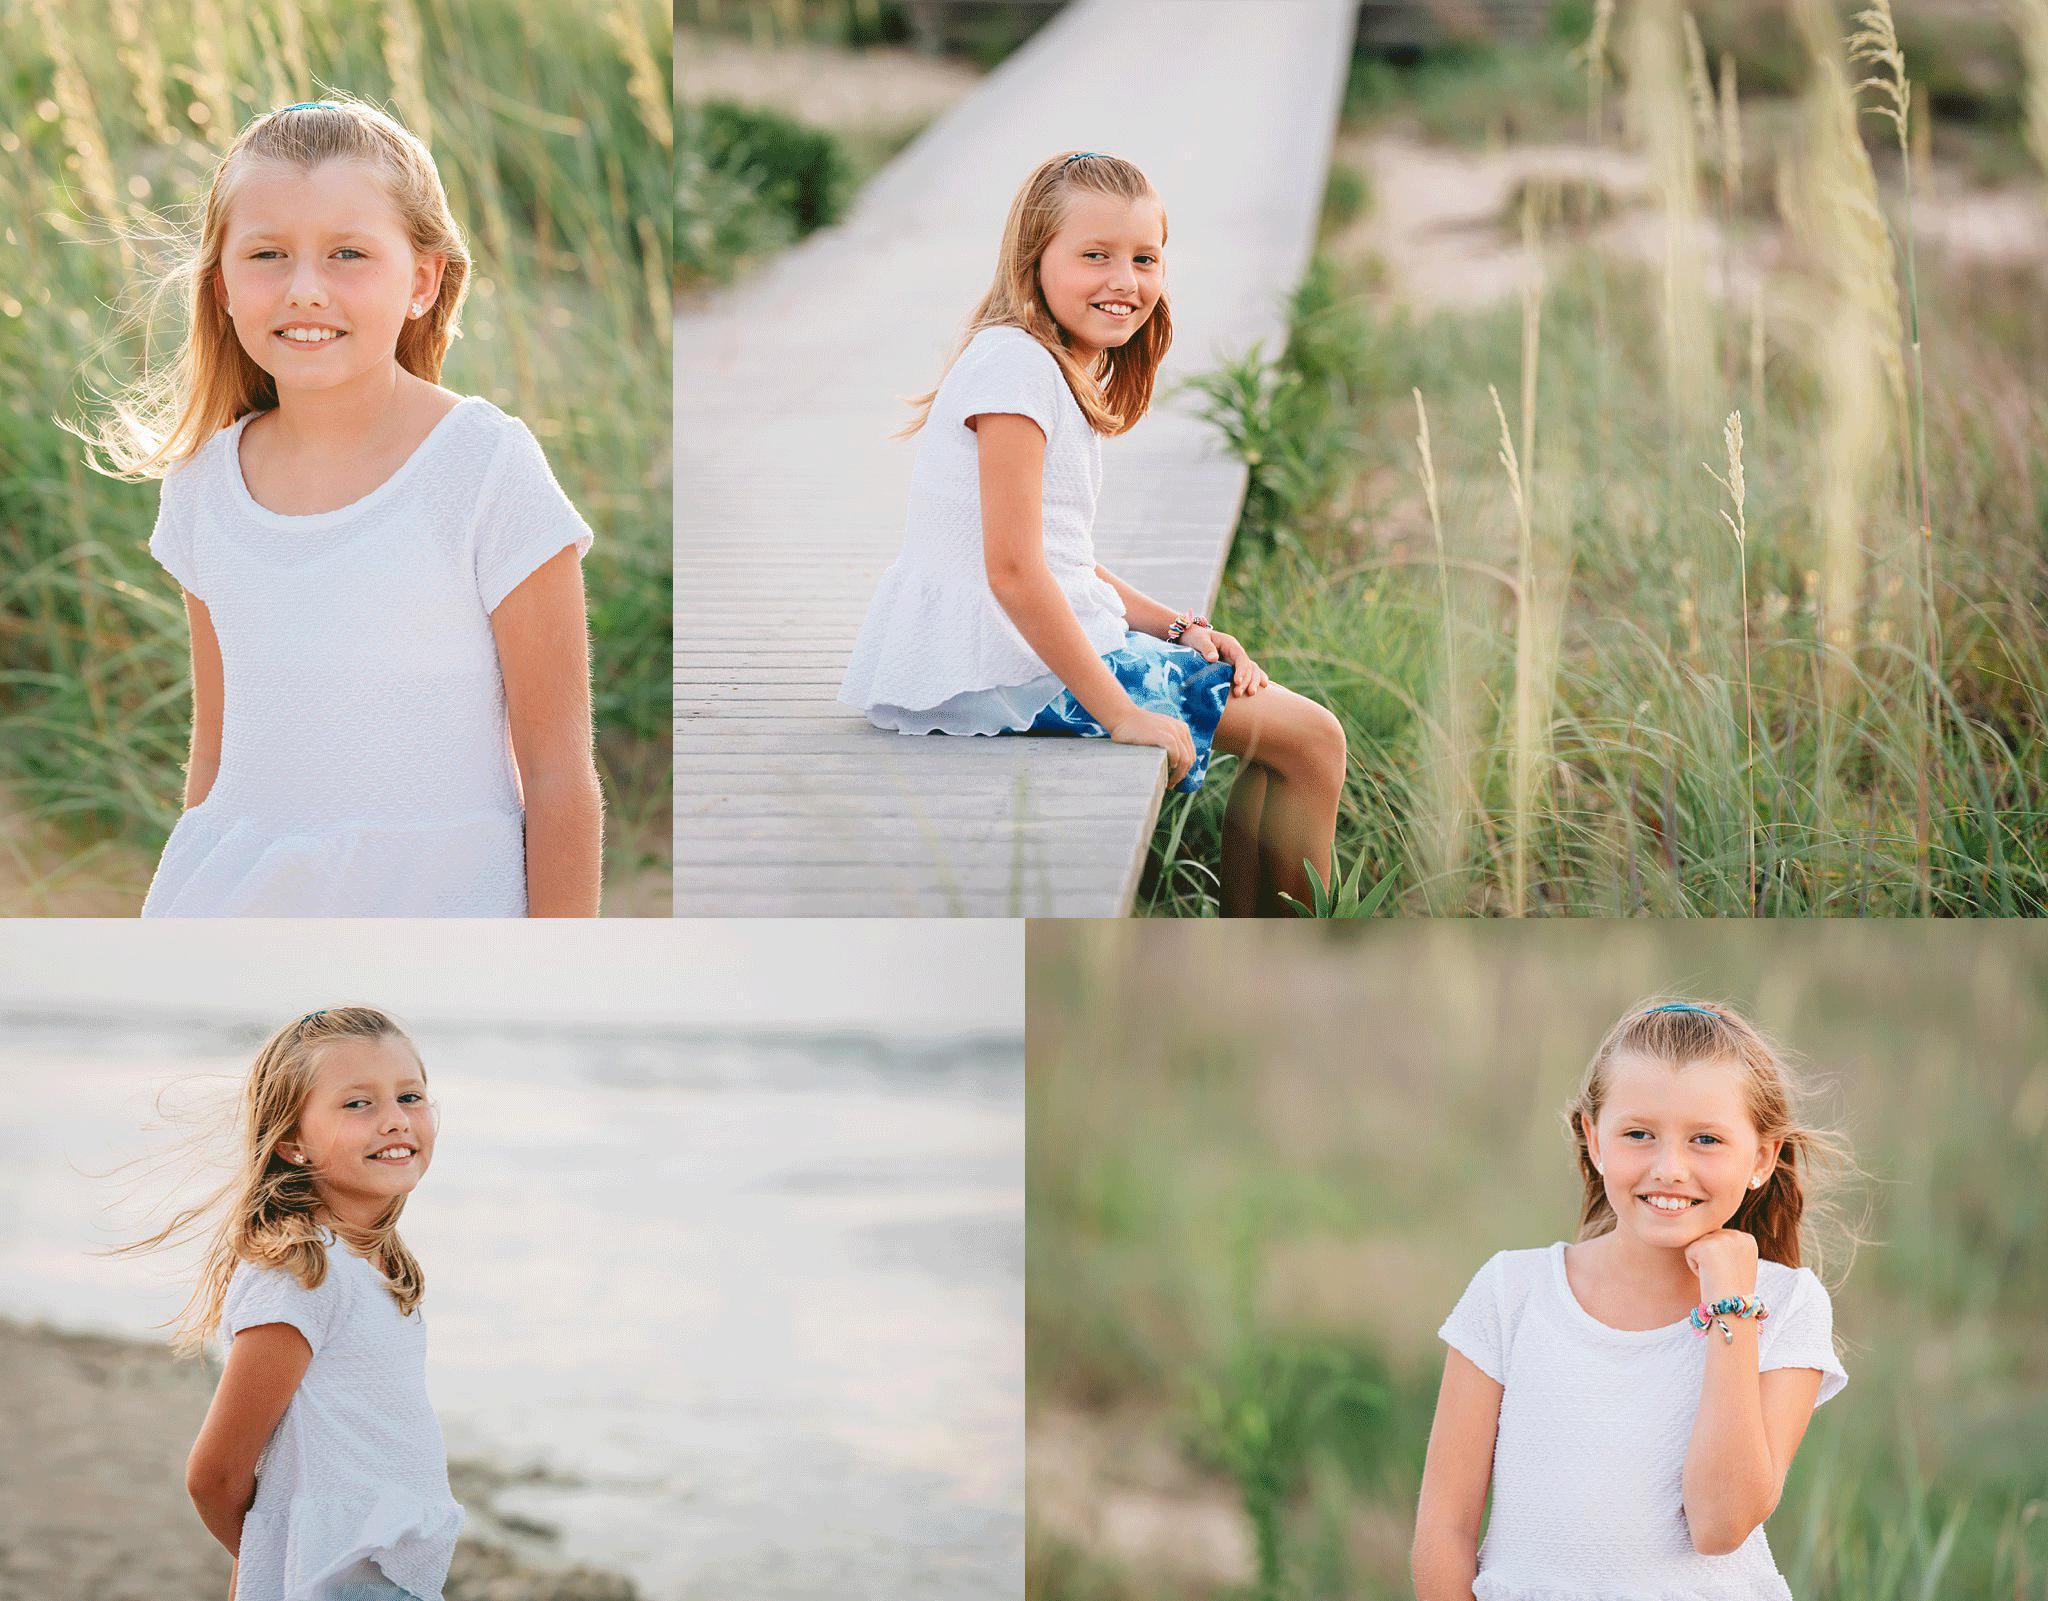 child-portrait-session-virginia-beach-oceanfront-photographers-melissa-bliss-photography-sandbridge-va-beach-photographer.png